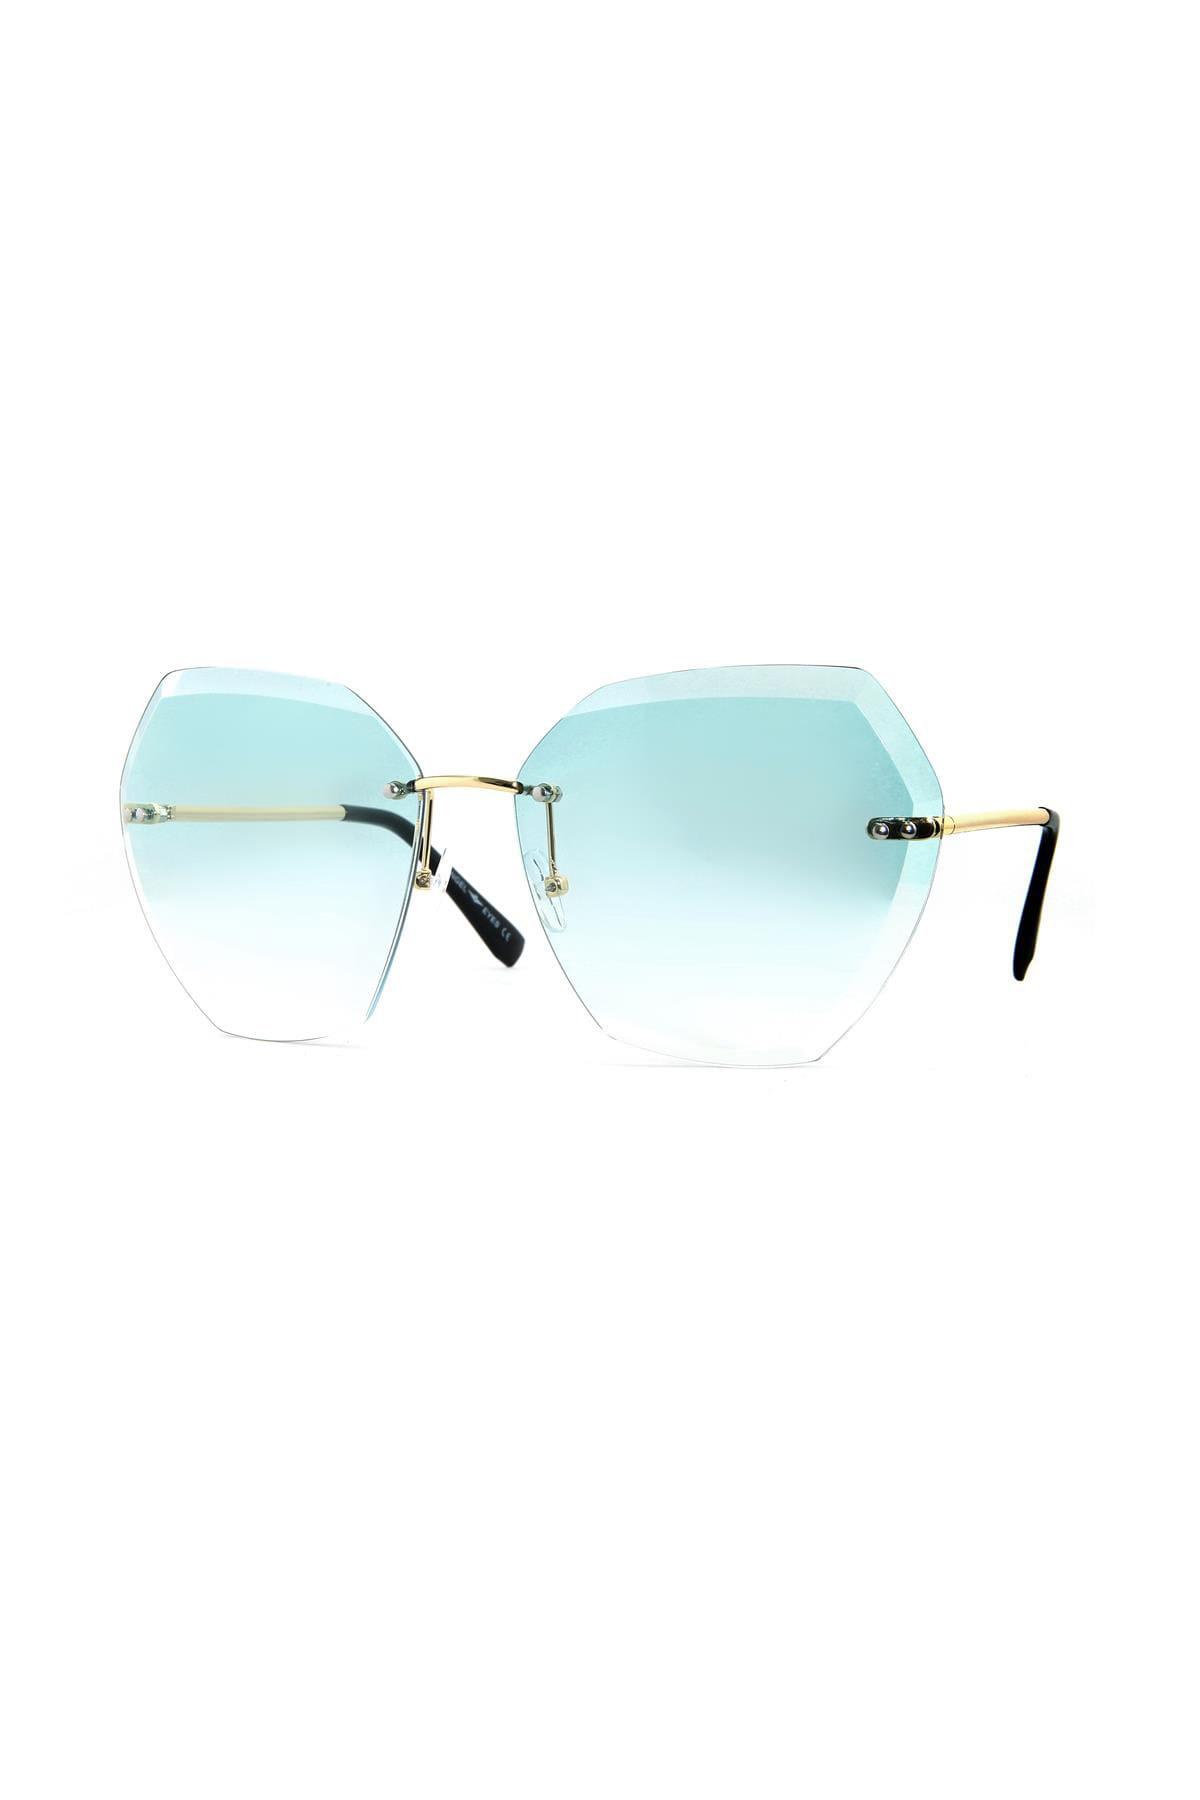 عینک آفتابی زنانه فروش برند Angel Eyes کد ty5912632